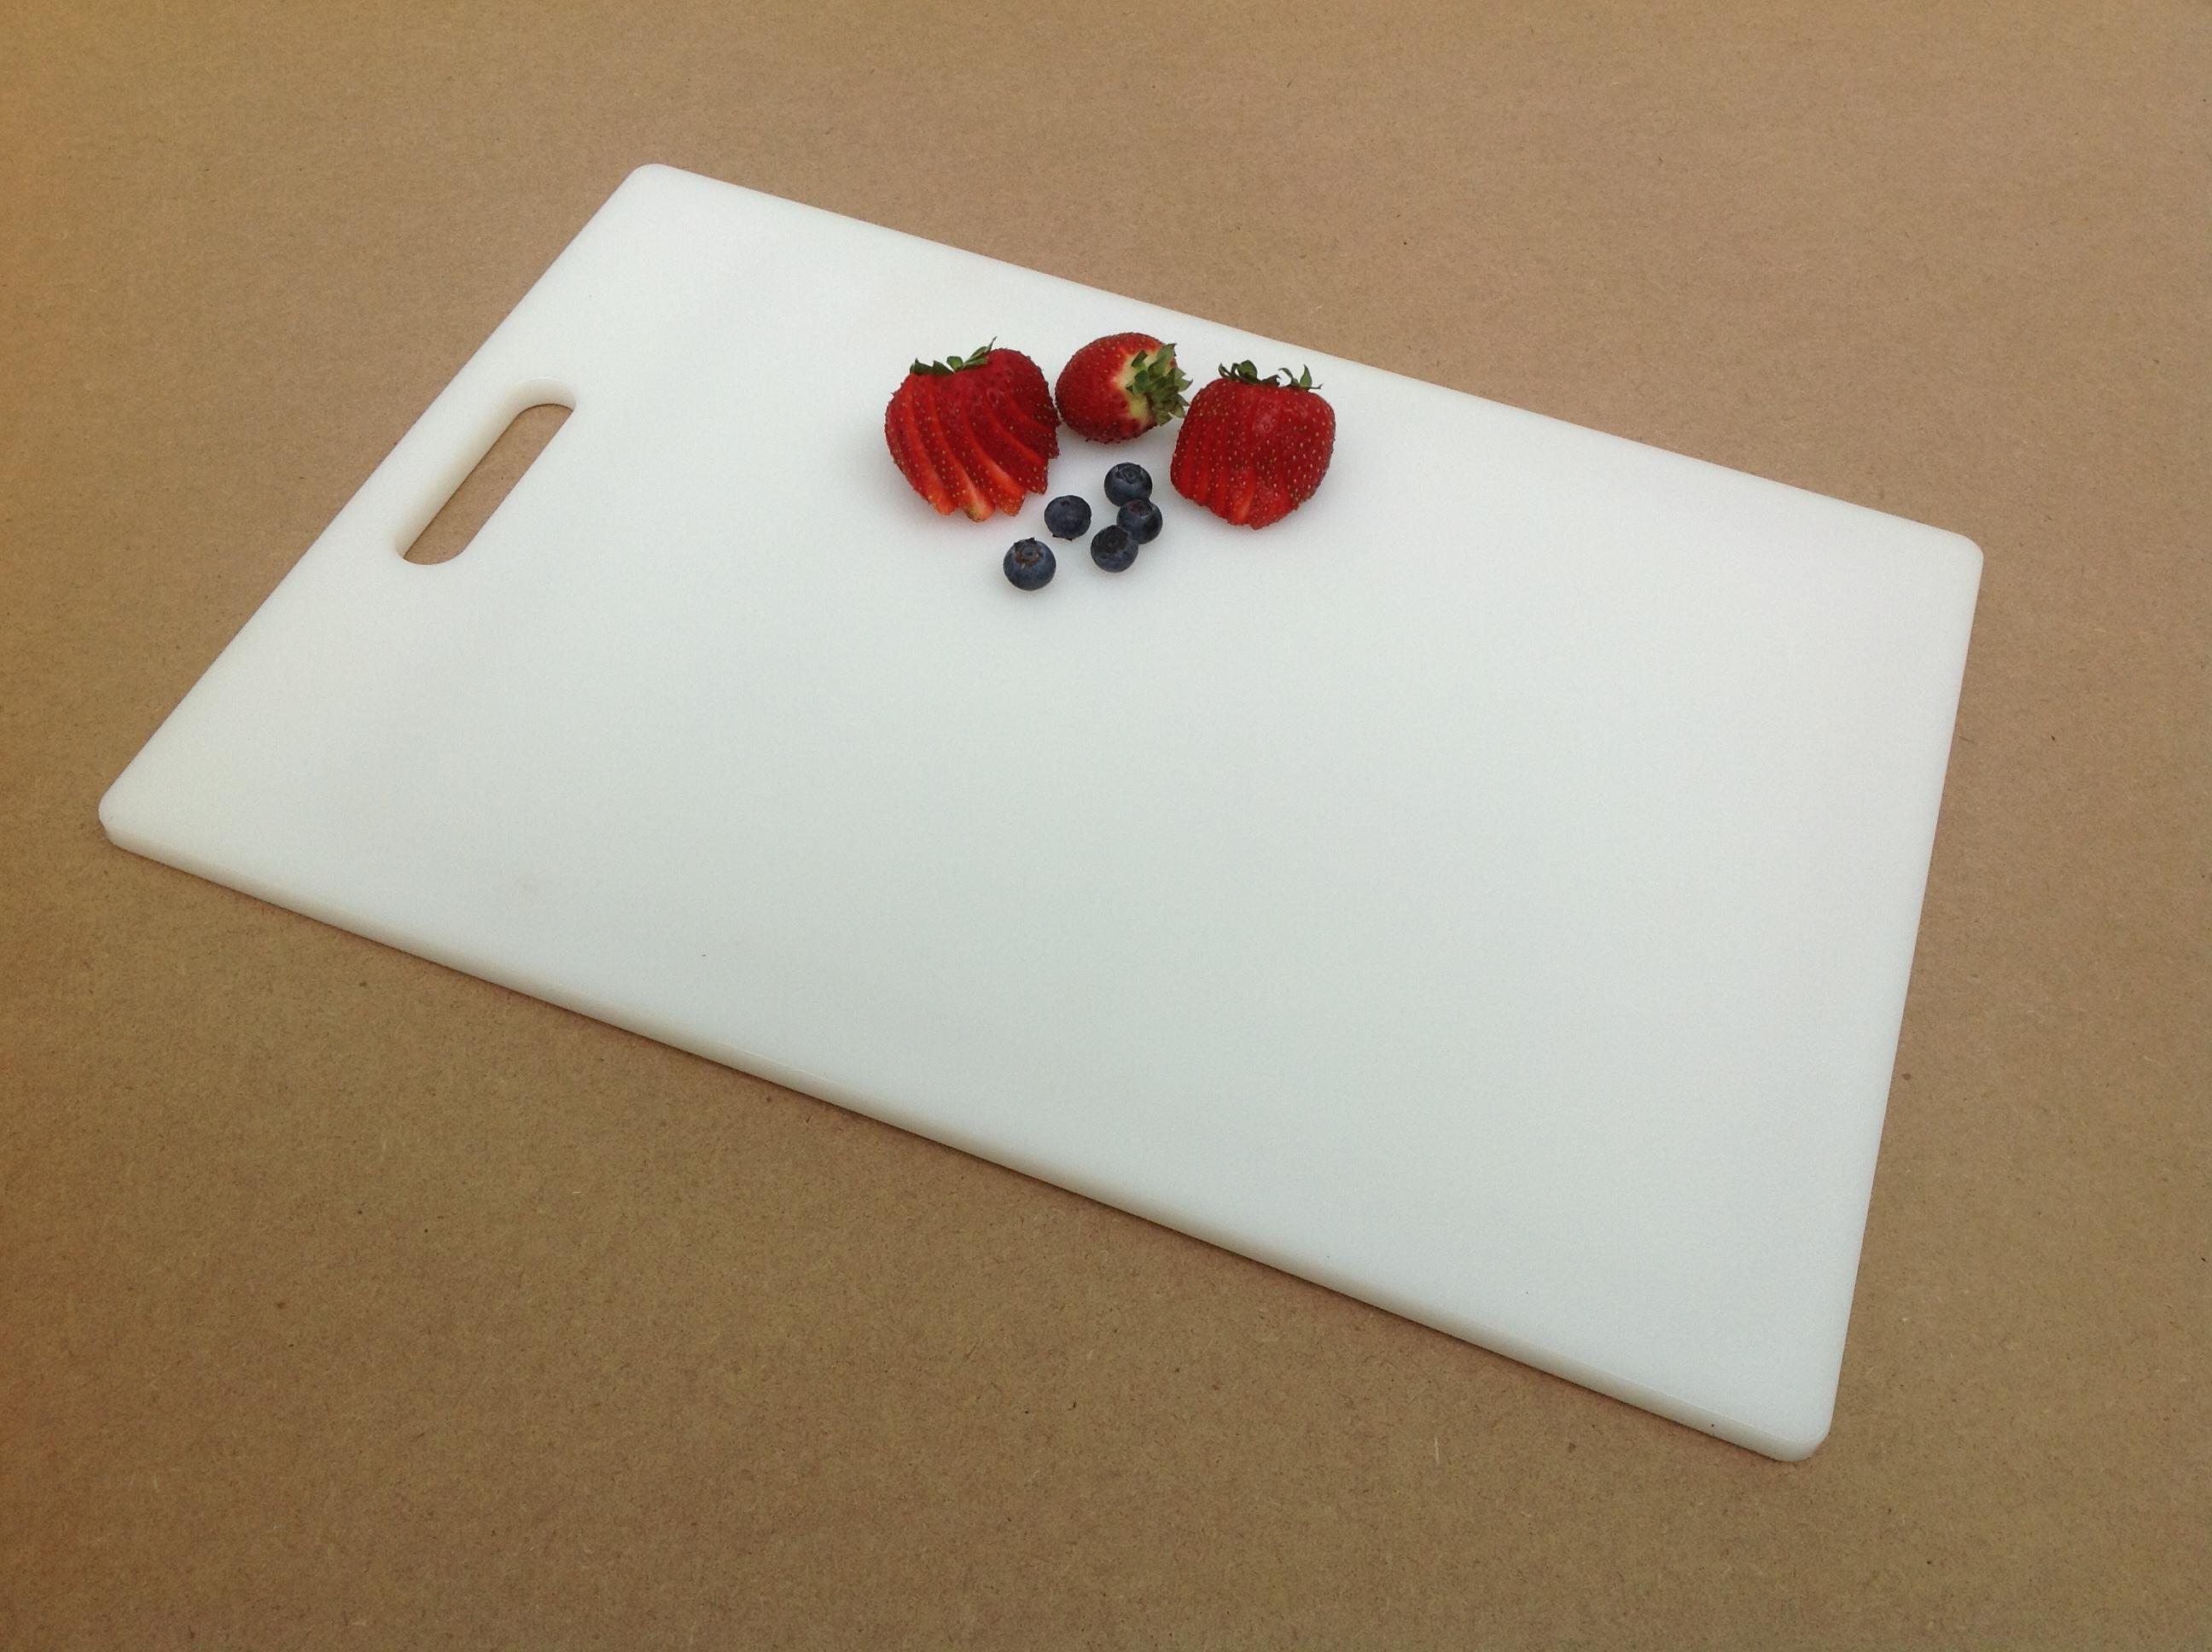 Hdpe Cutting Board Acme Plastics Inc